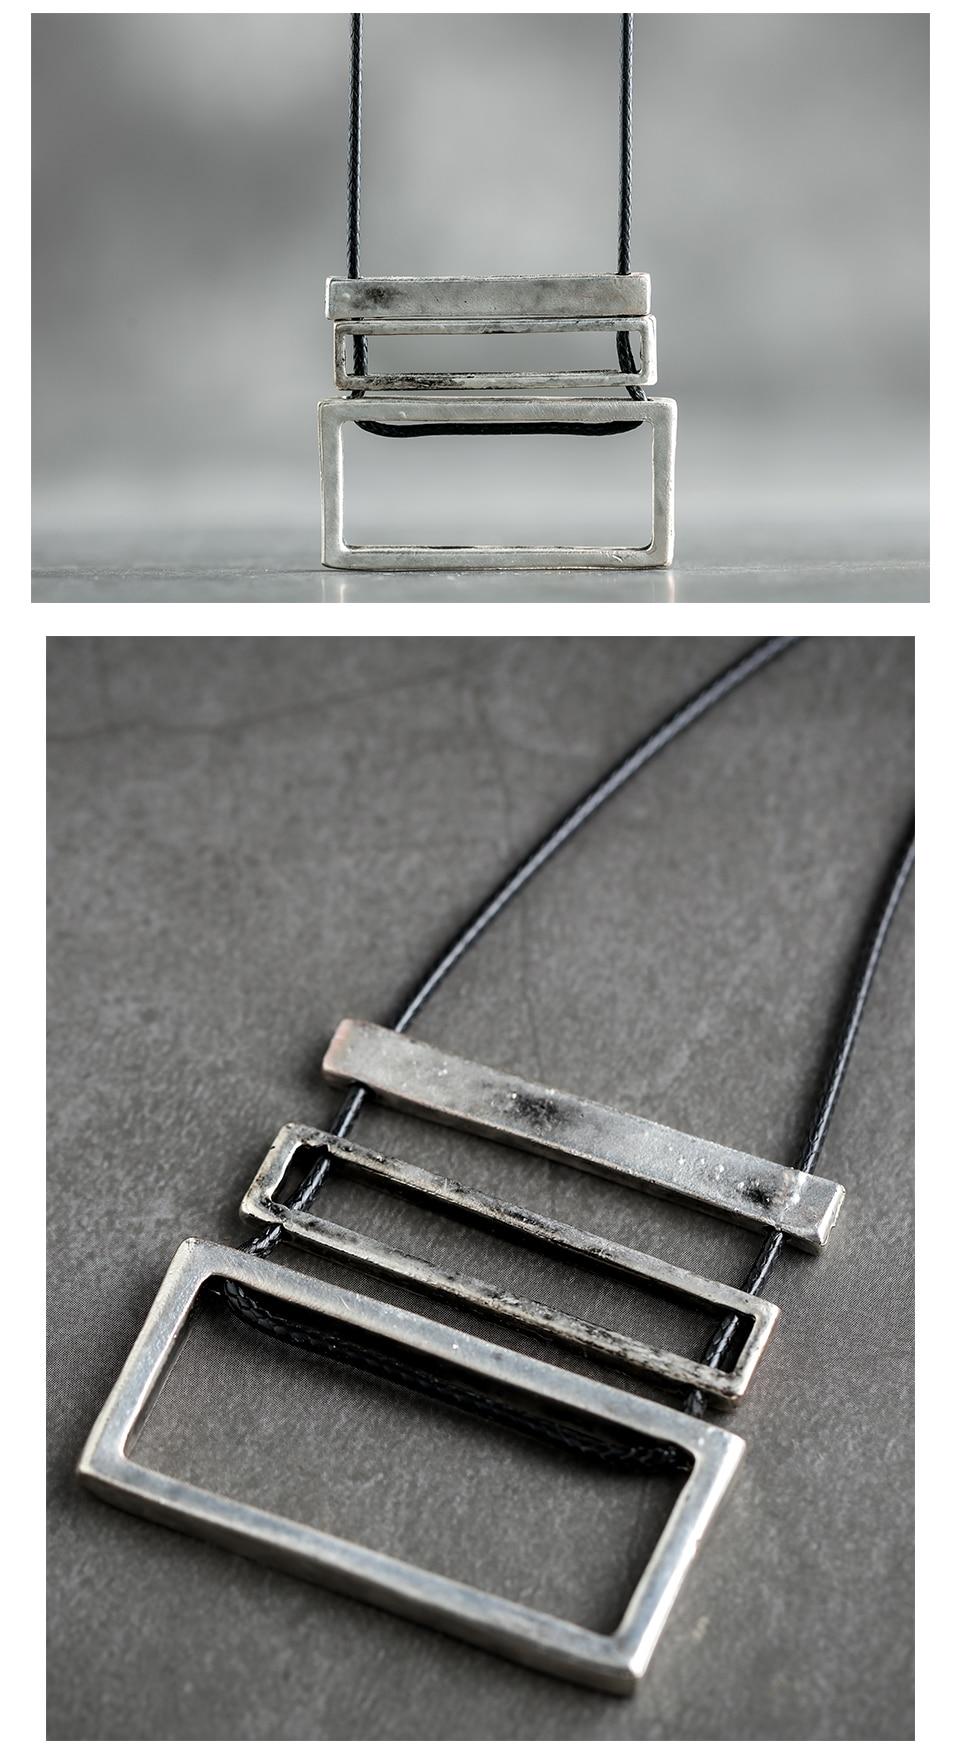 Women Jewelry Long Necklaces Vintage Rope Chain necklaces & pendants women collares mujer choker kolye bijoux femme